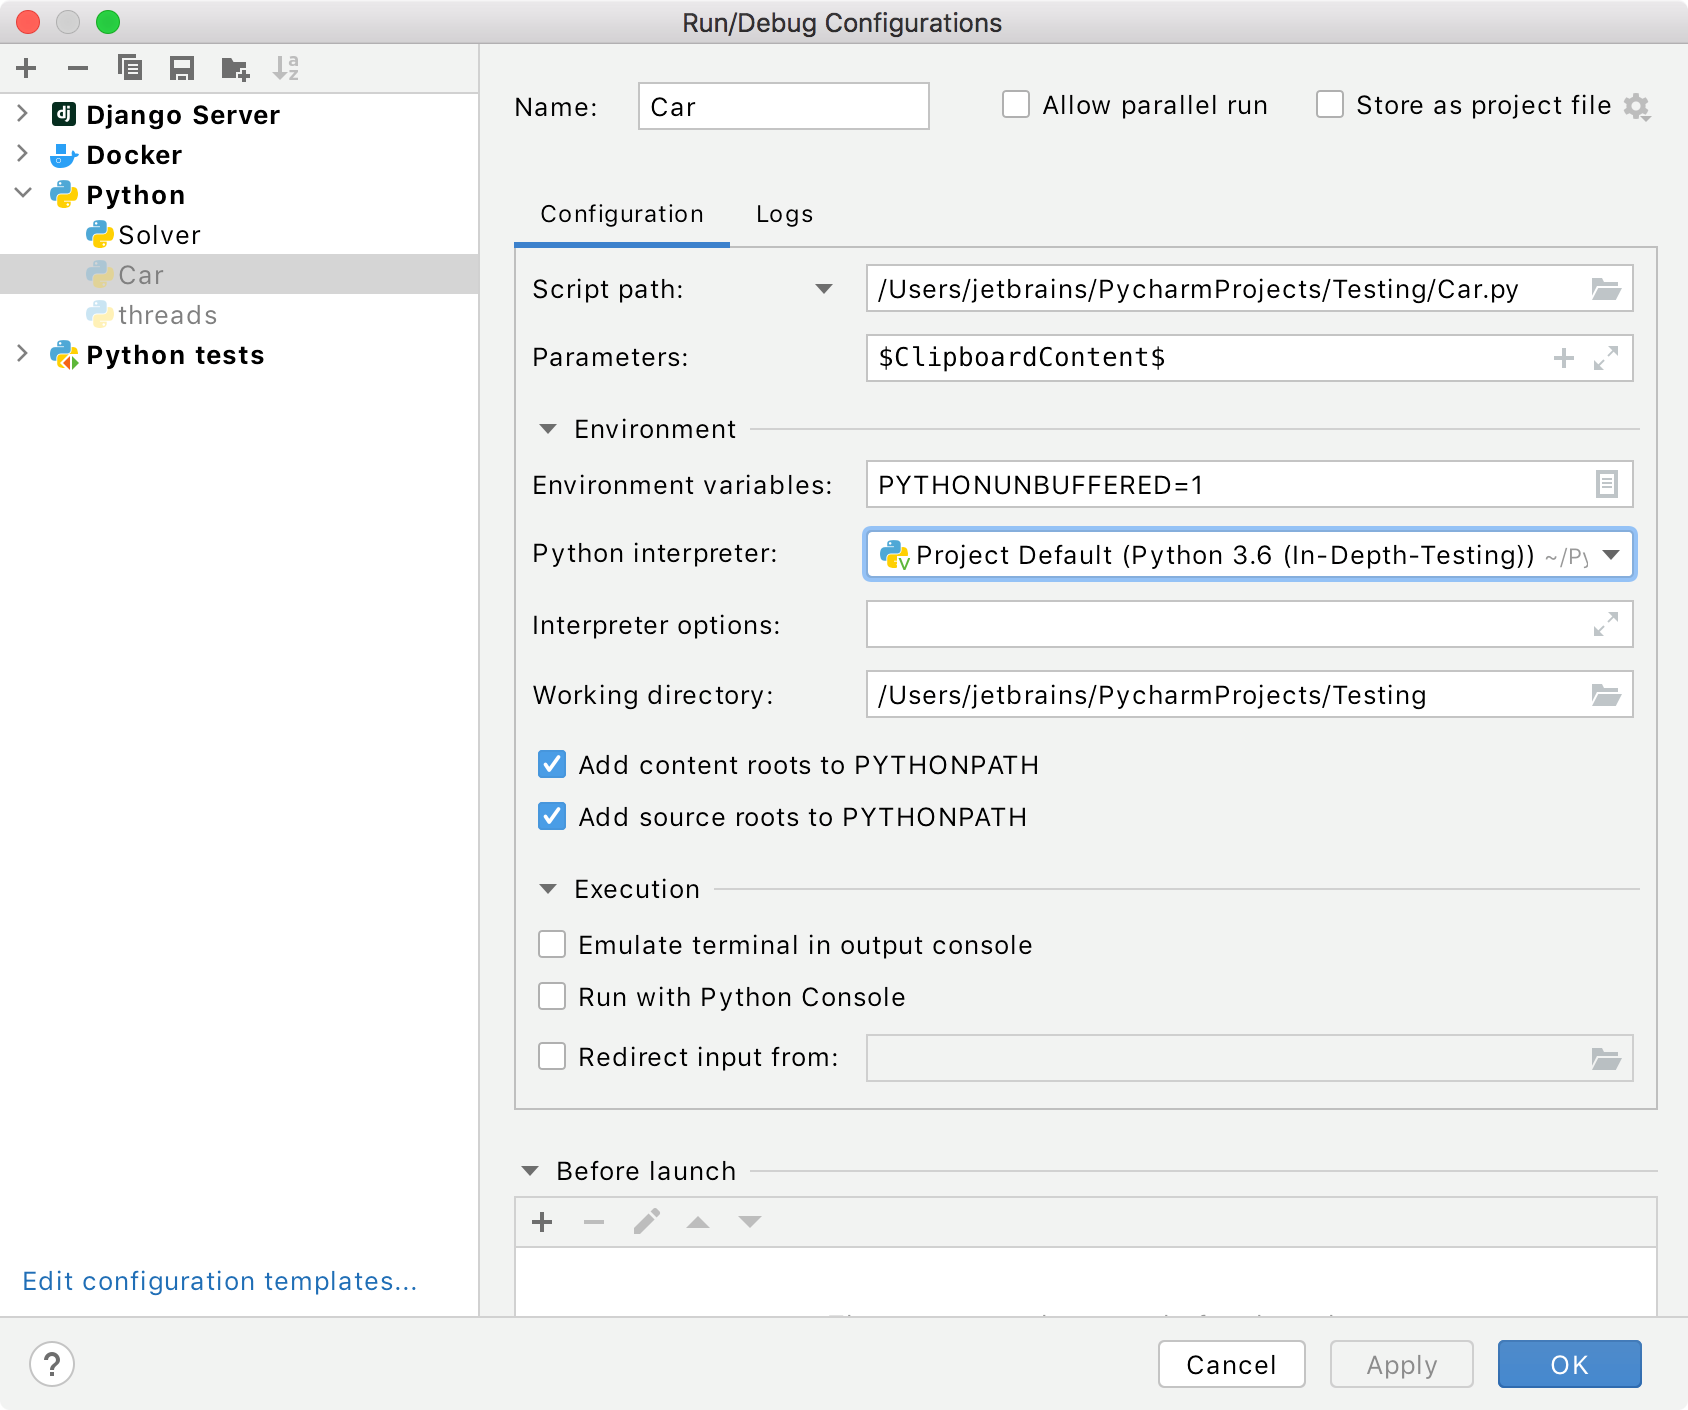 creating a new run/debug configuration